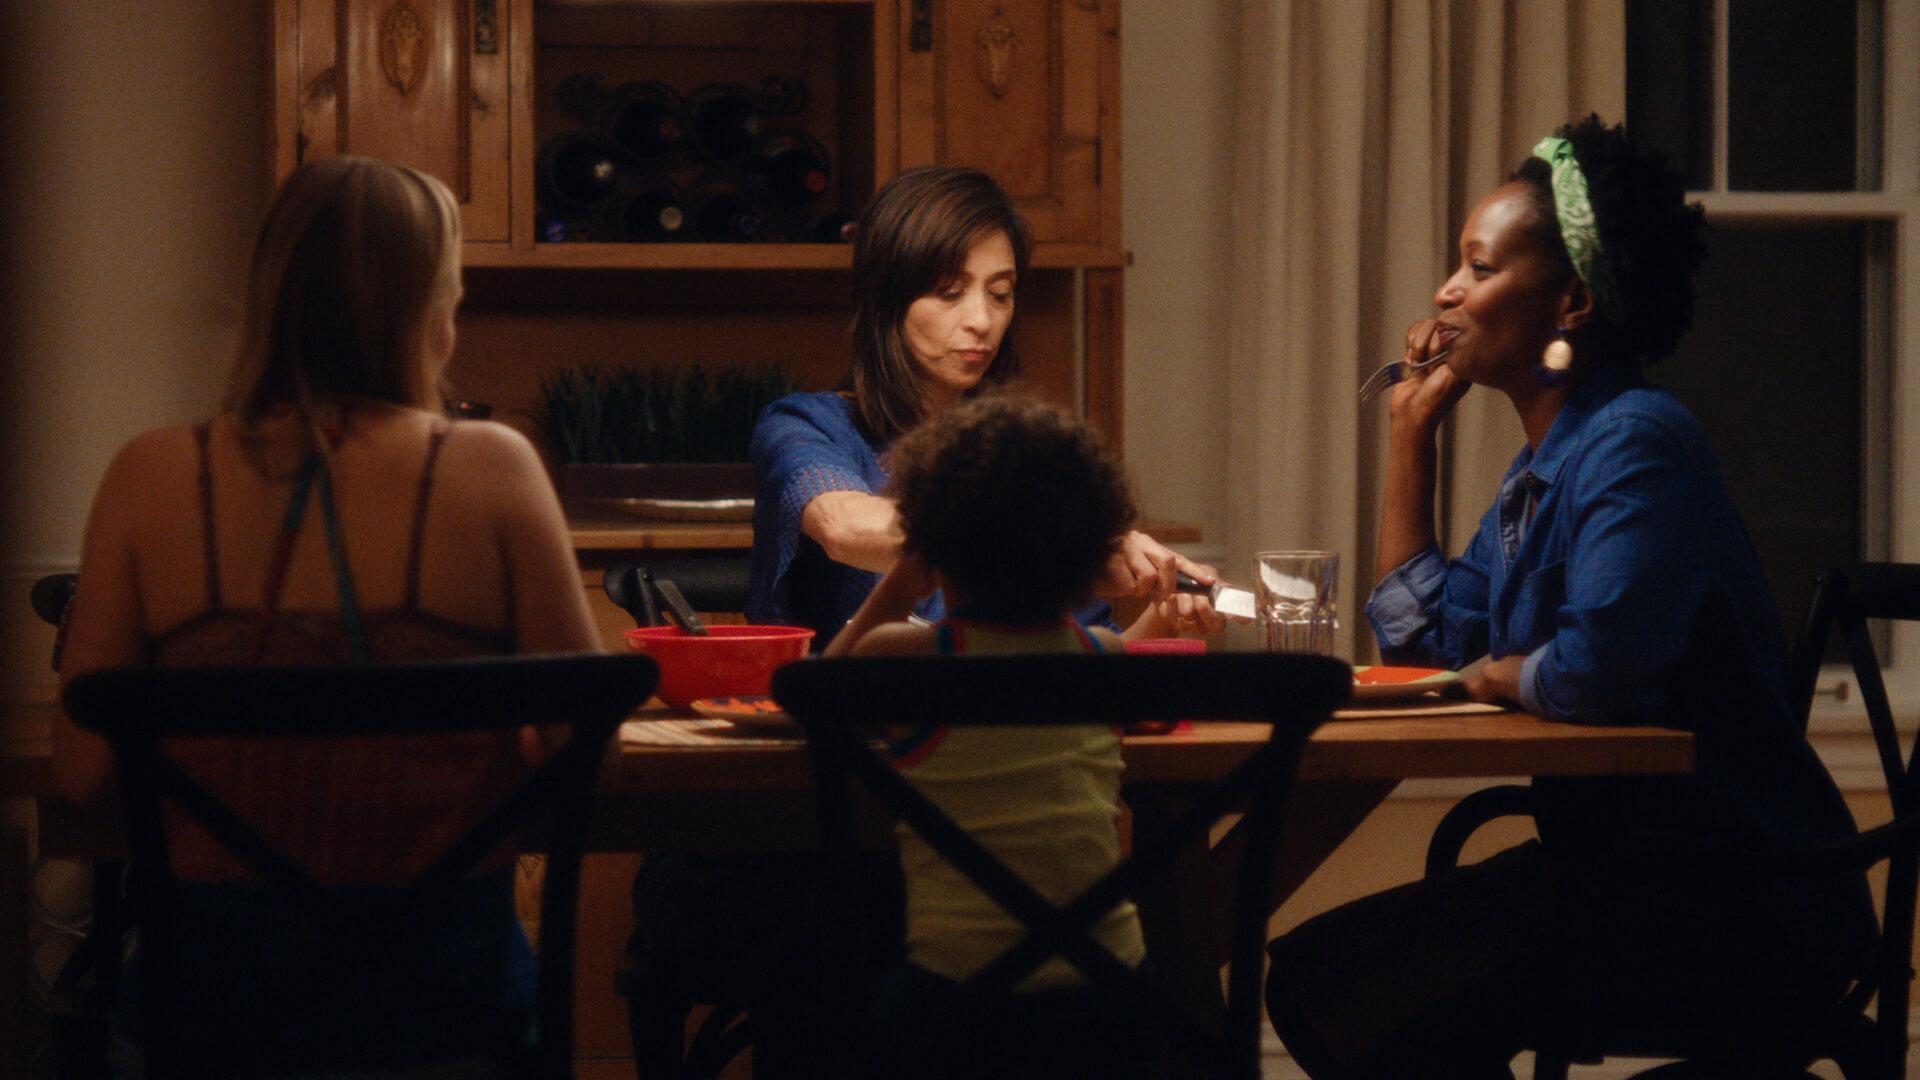 saint-frances-2019-movie-kelly-osullivan